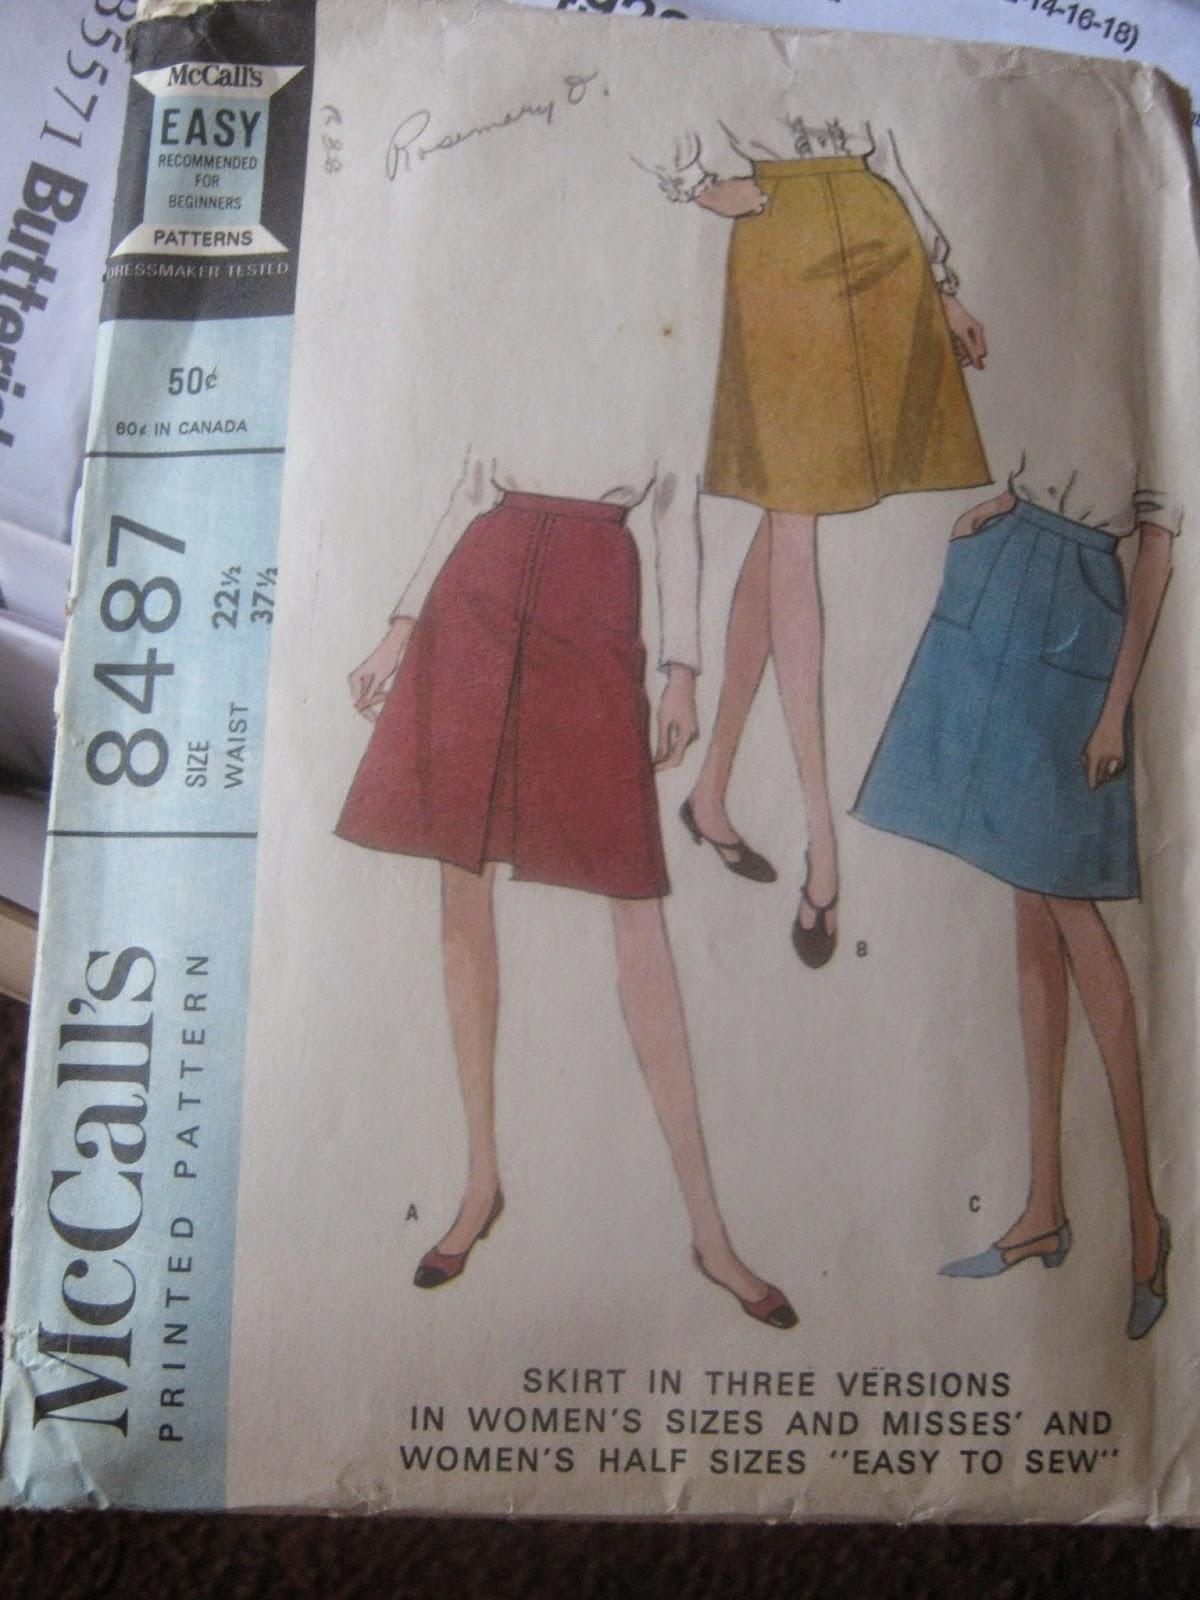 McCall's 8487 Skirt www.sewplus.blogspot.com